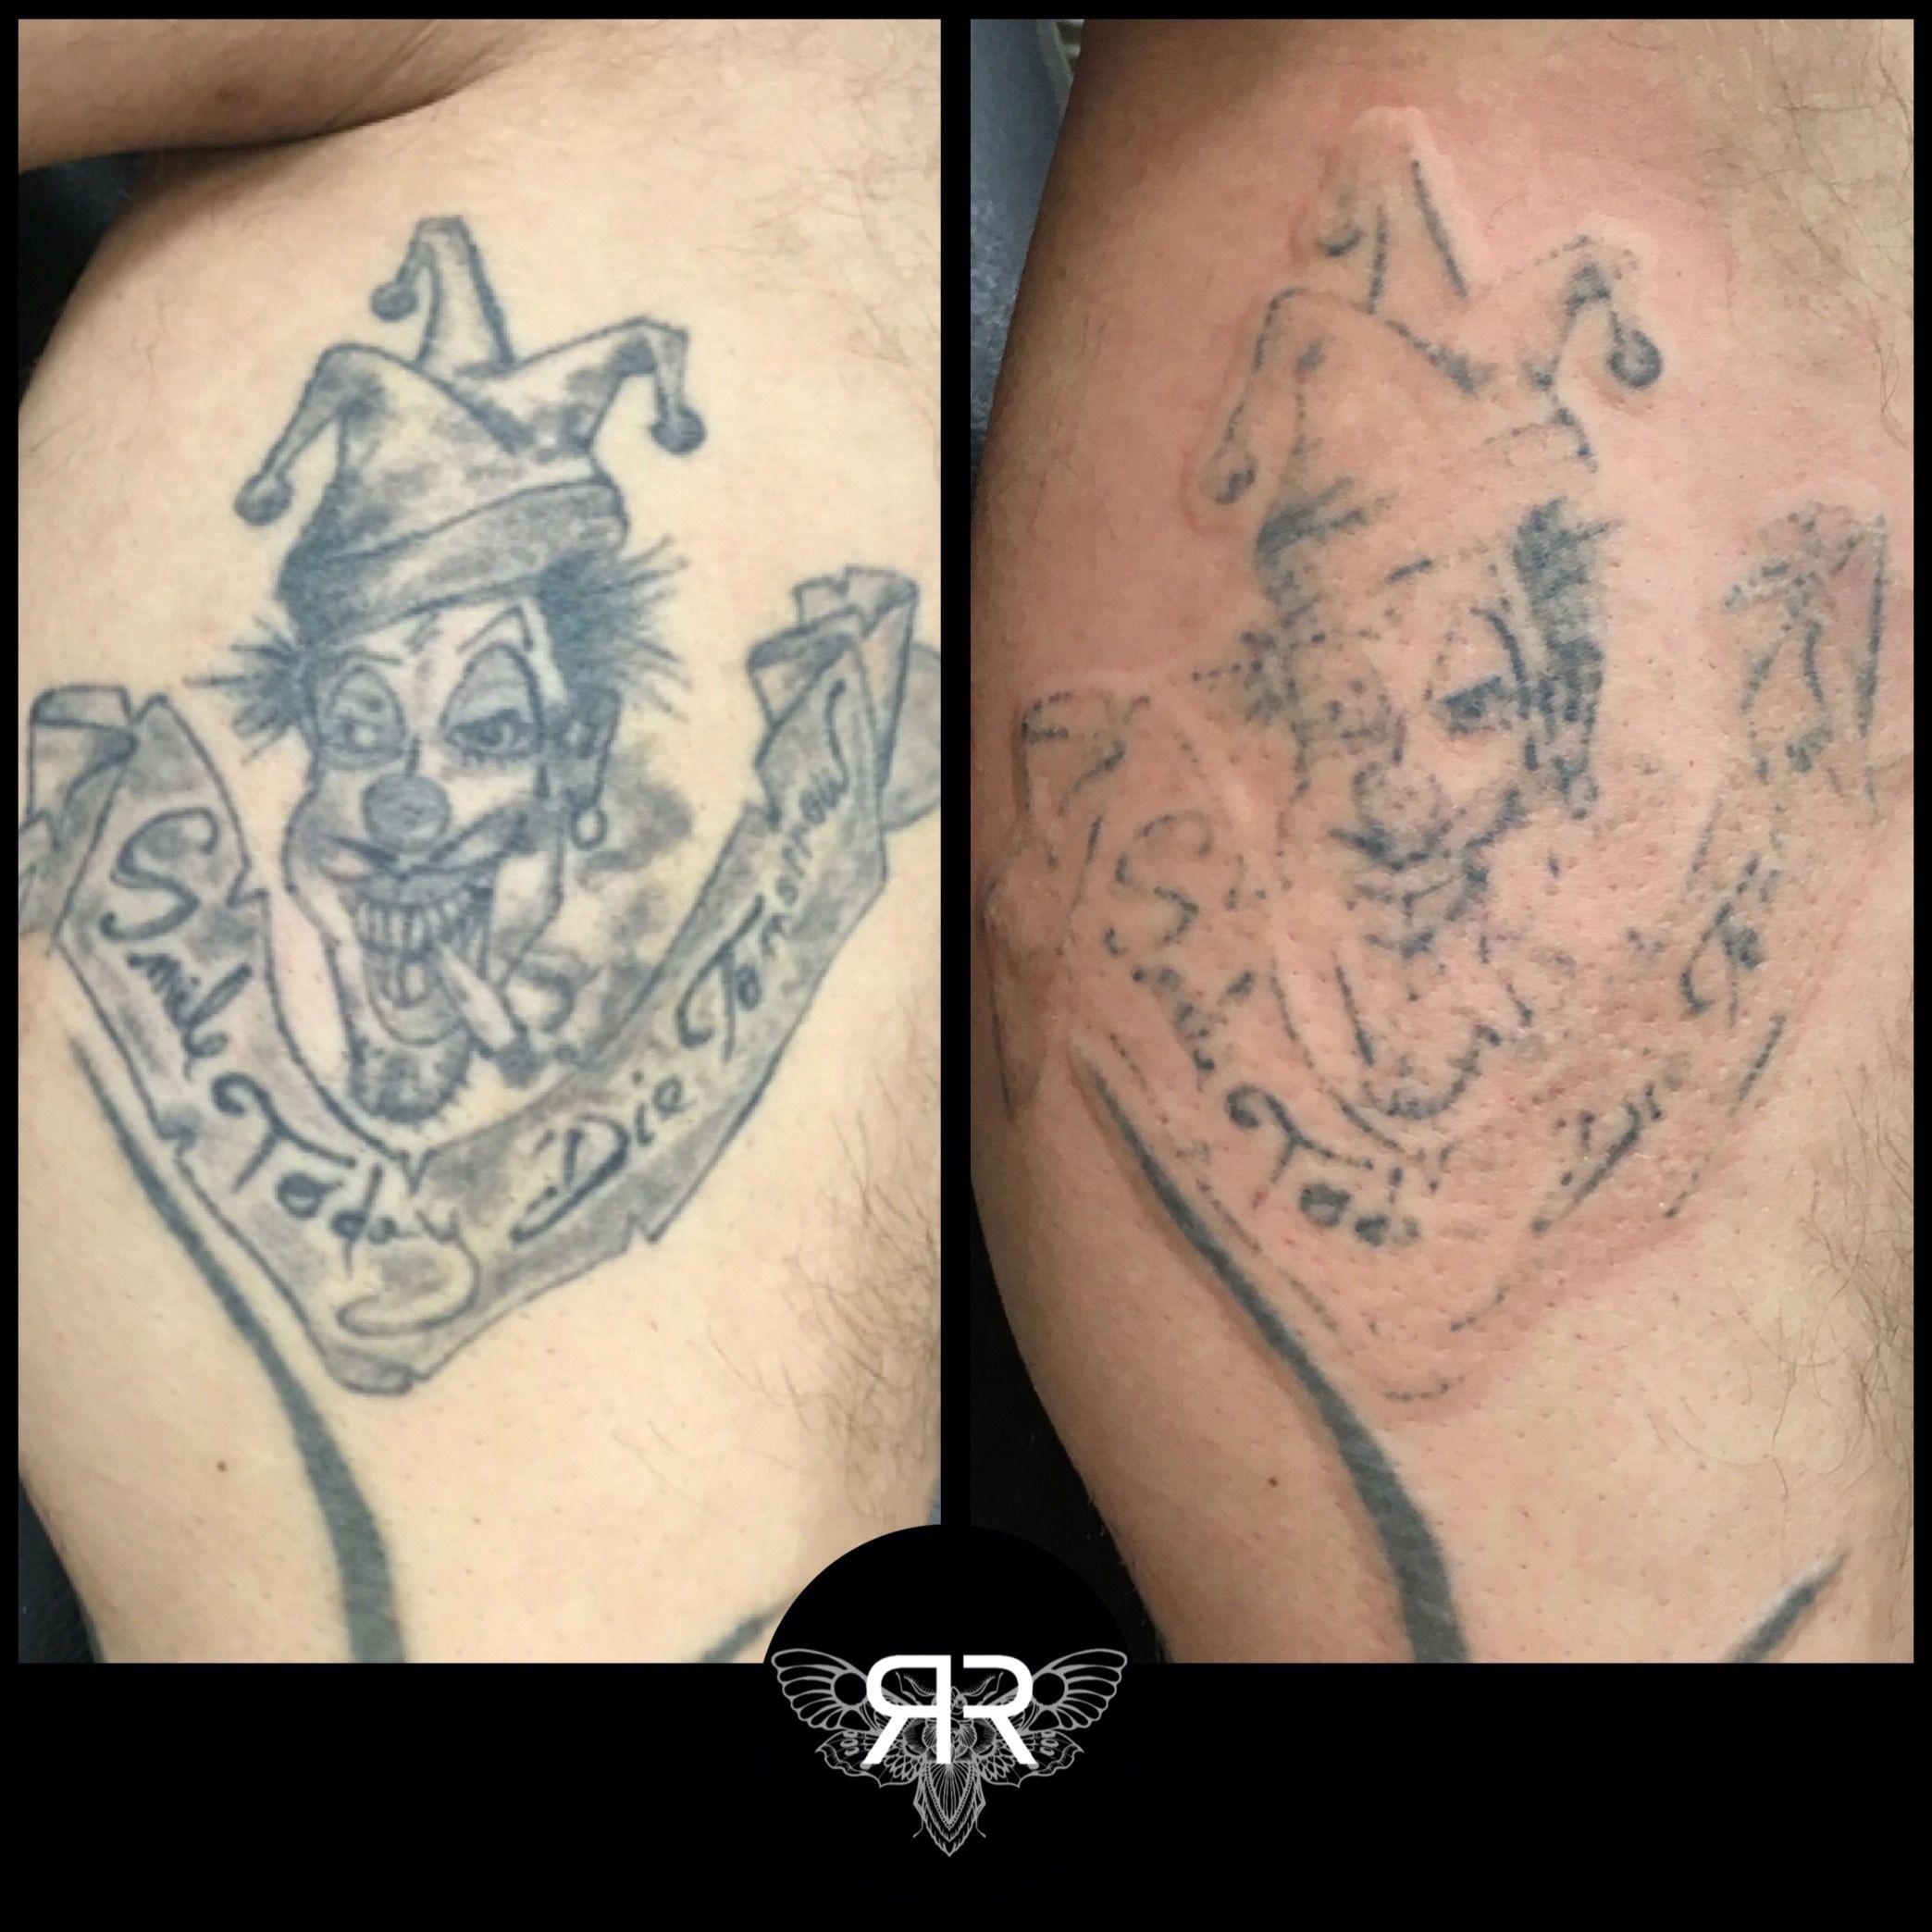 picosure tattoo removal on dark skin